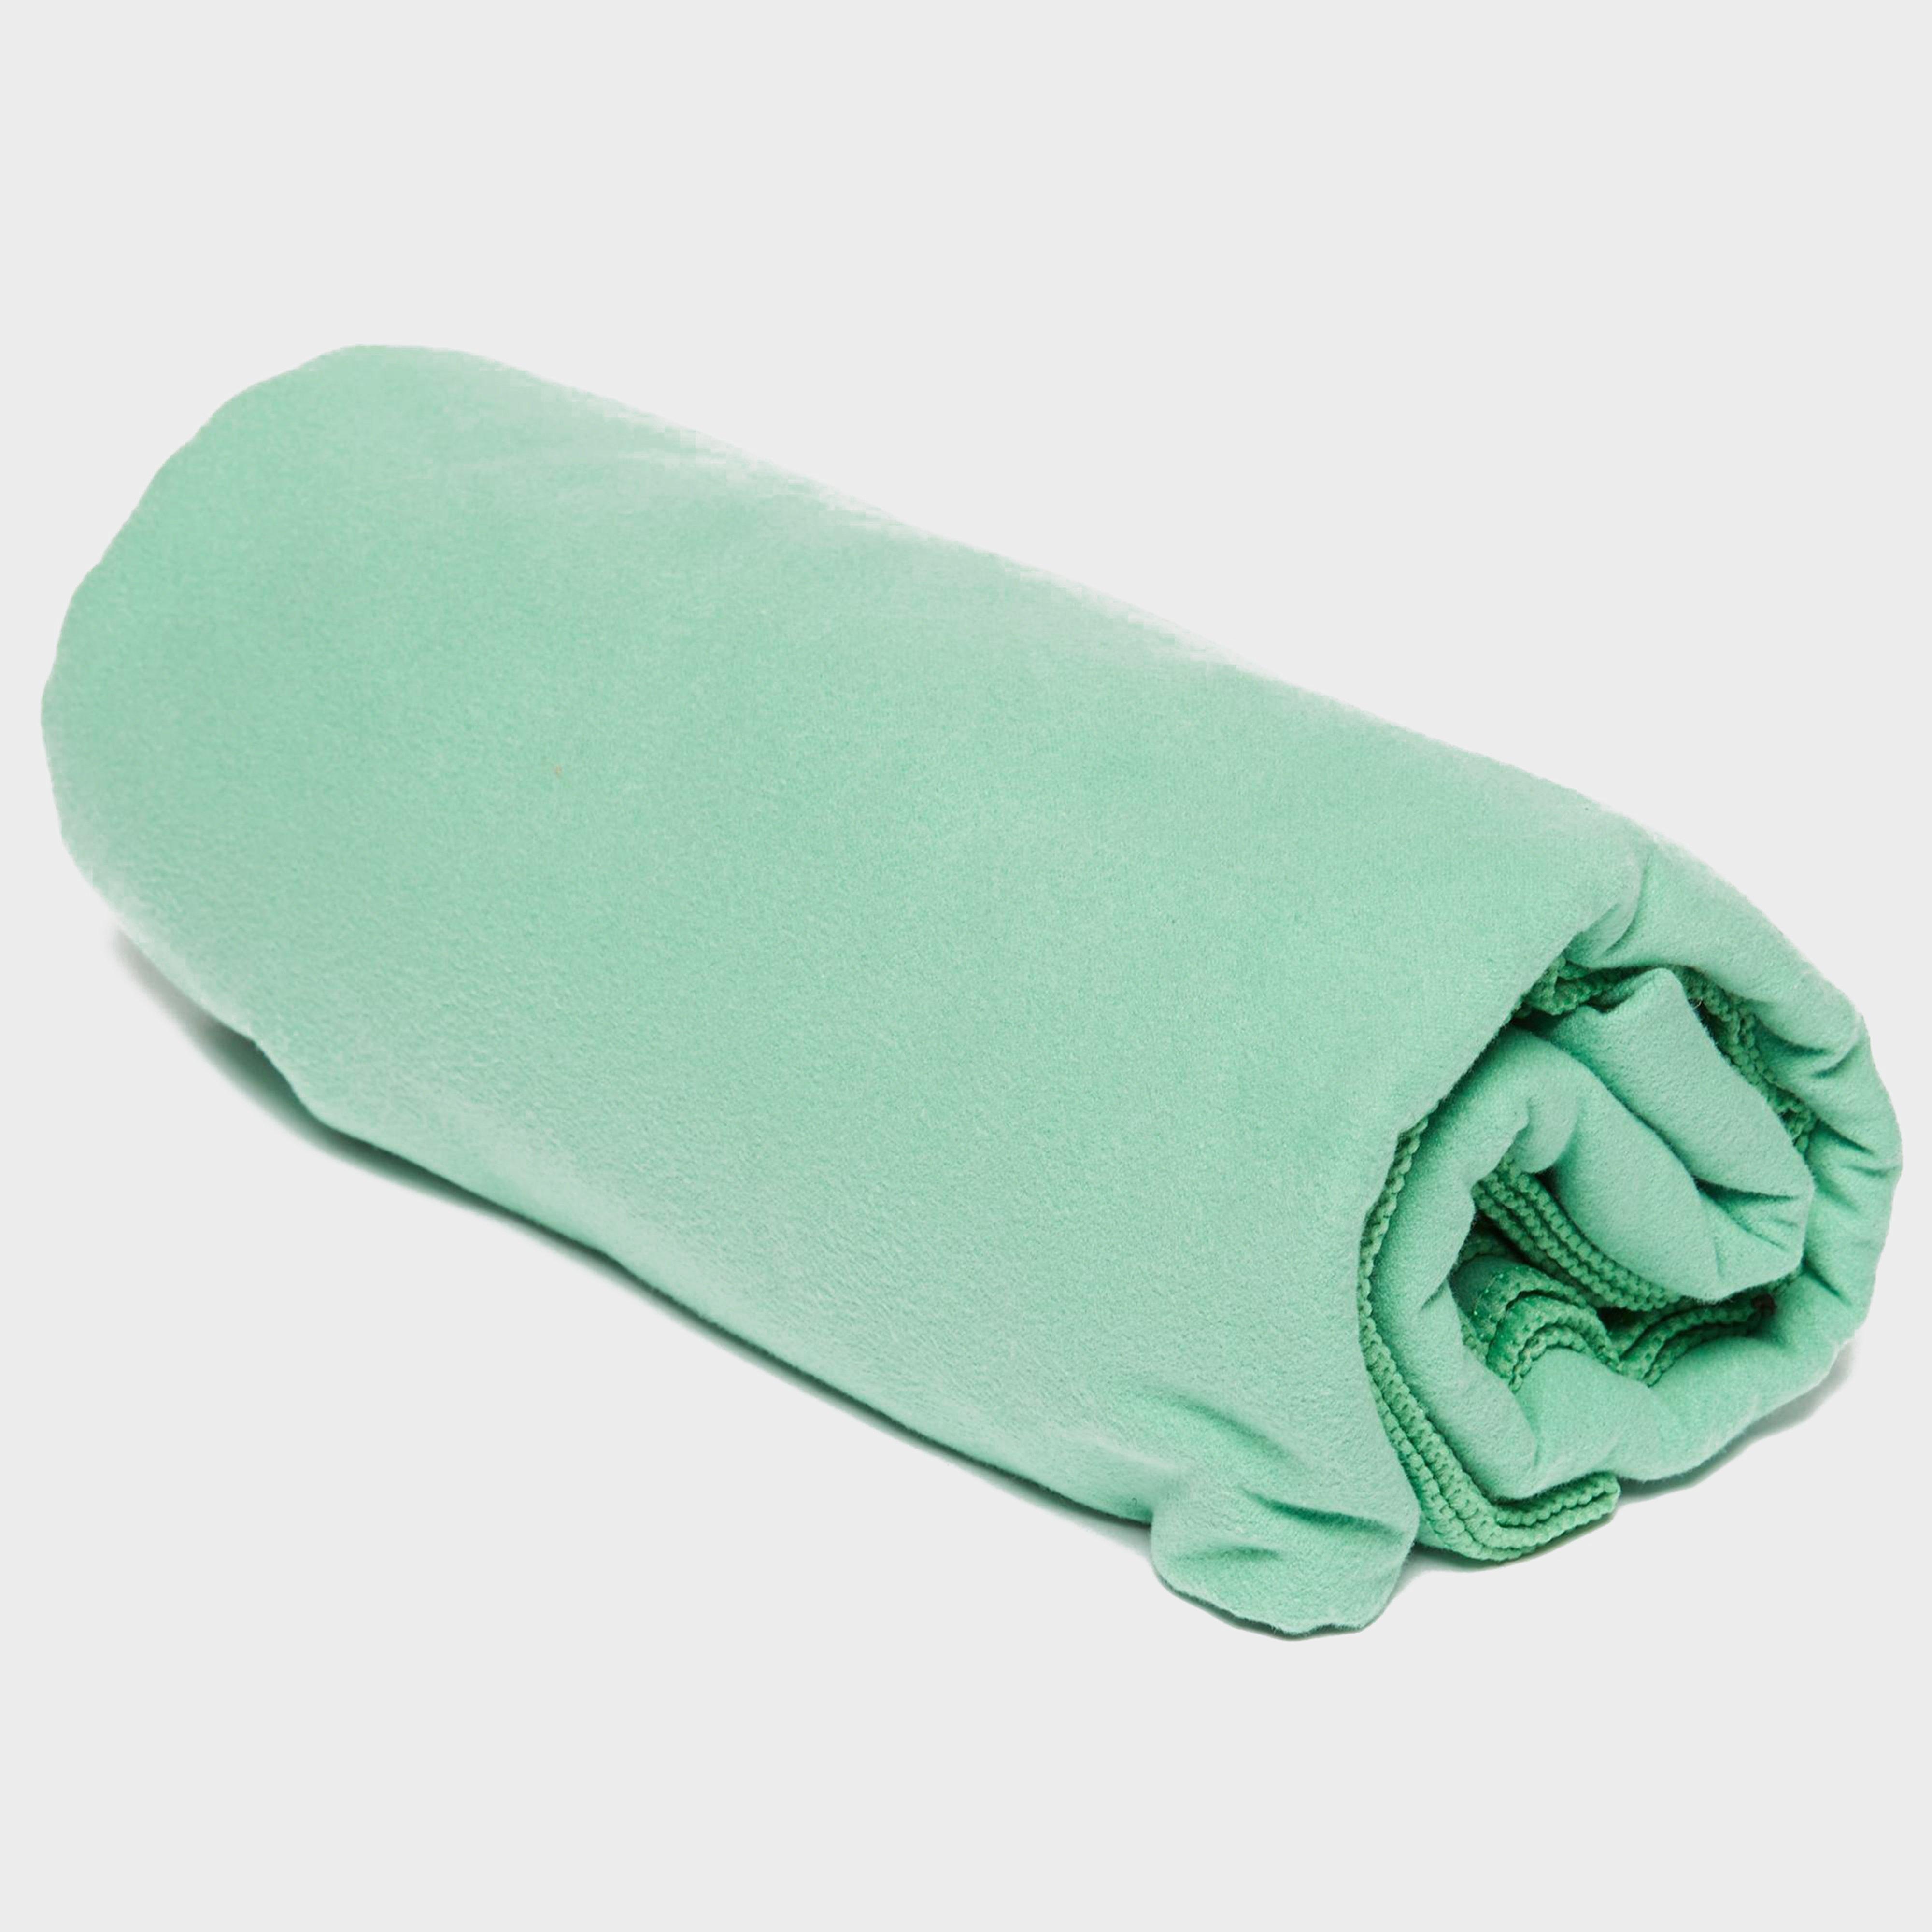 Eurohike Eurohike Suede Microfibre Travel Towel - Large - Green, Green